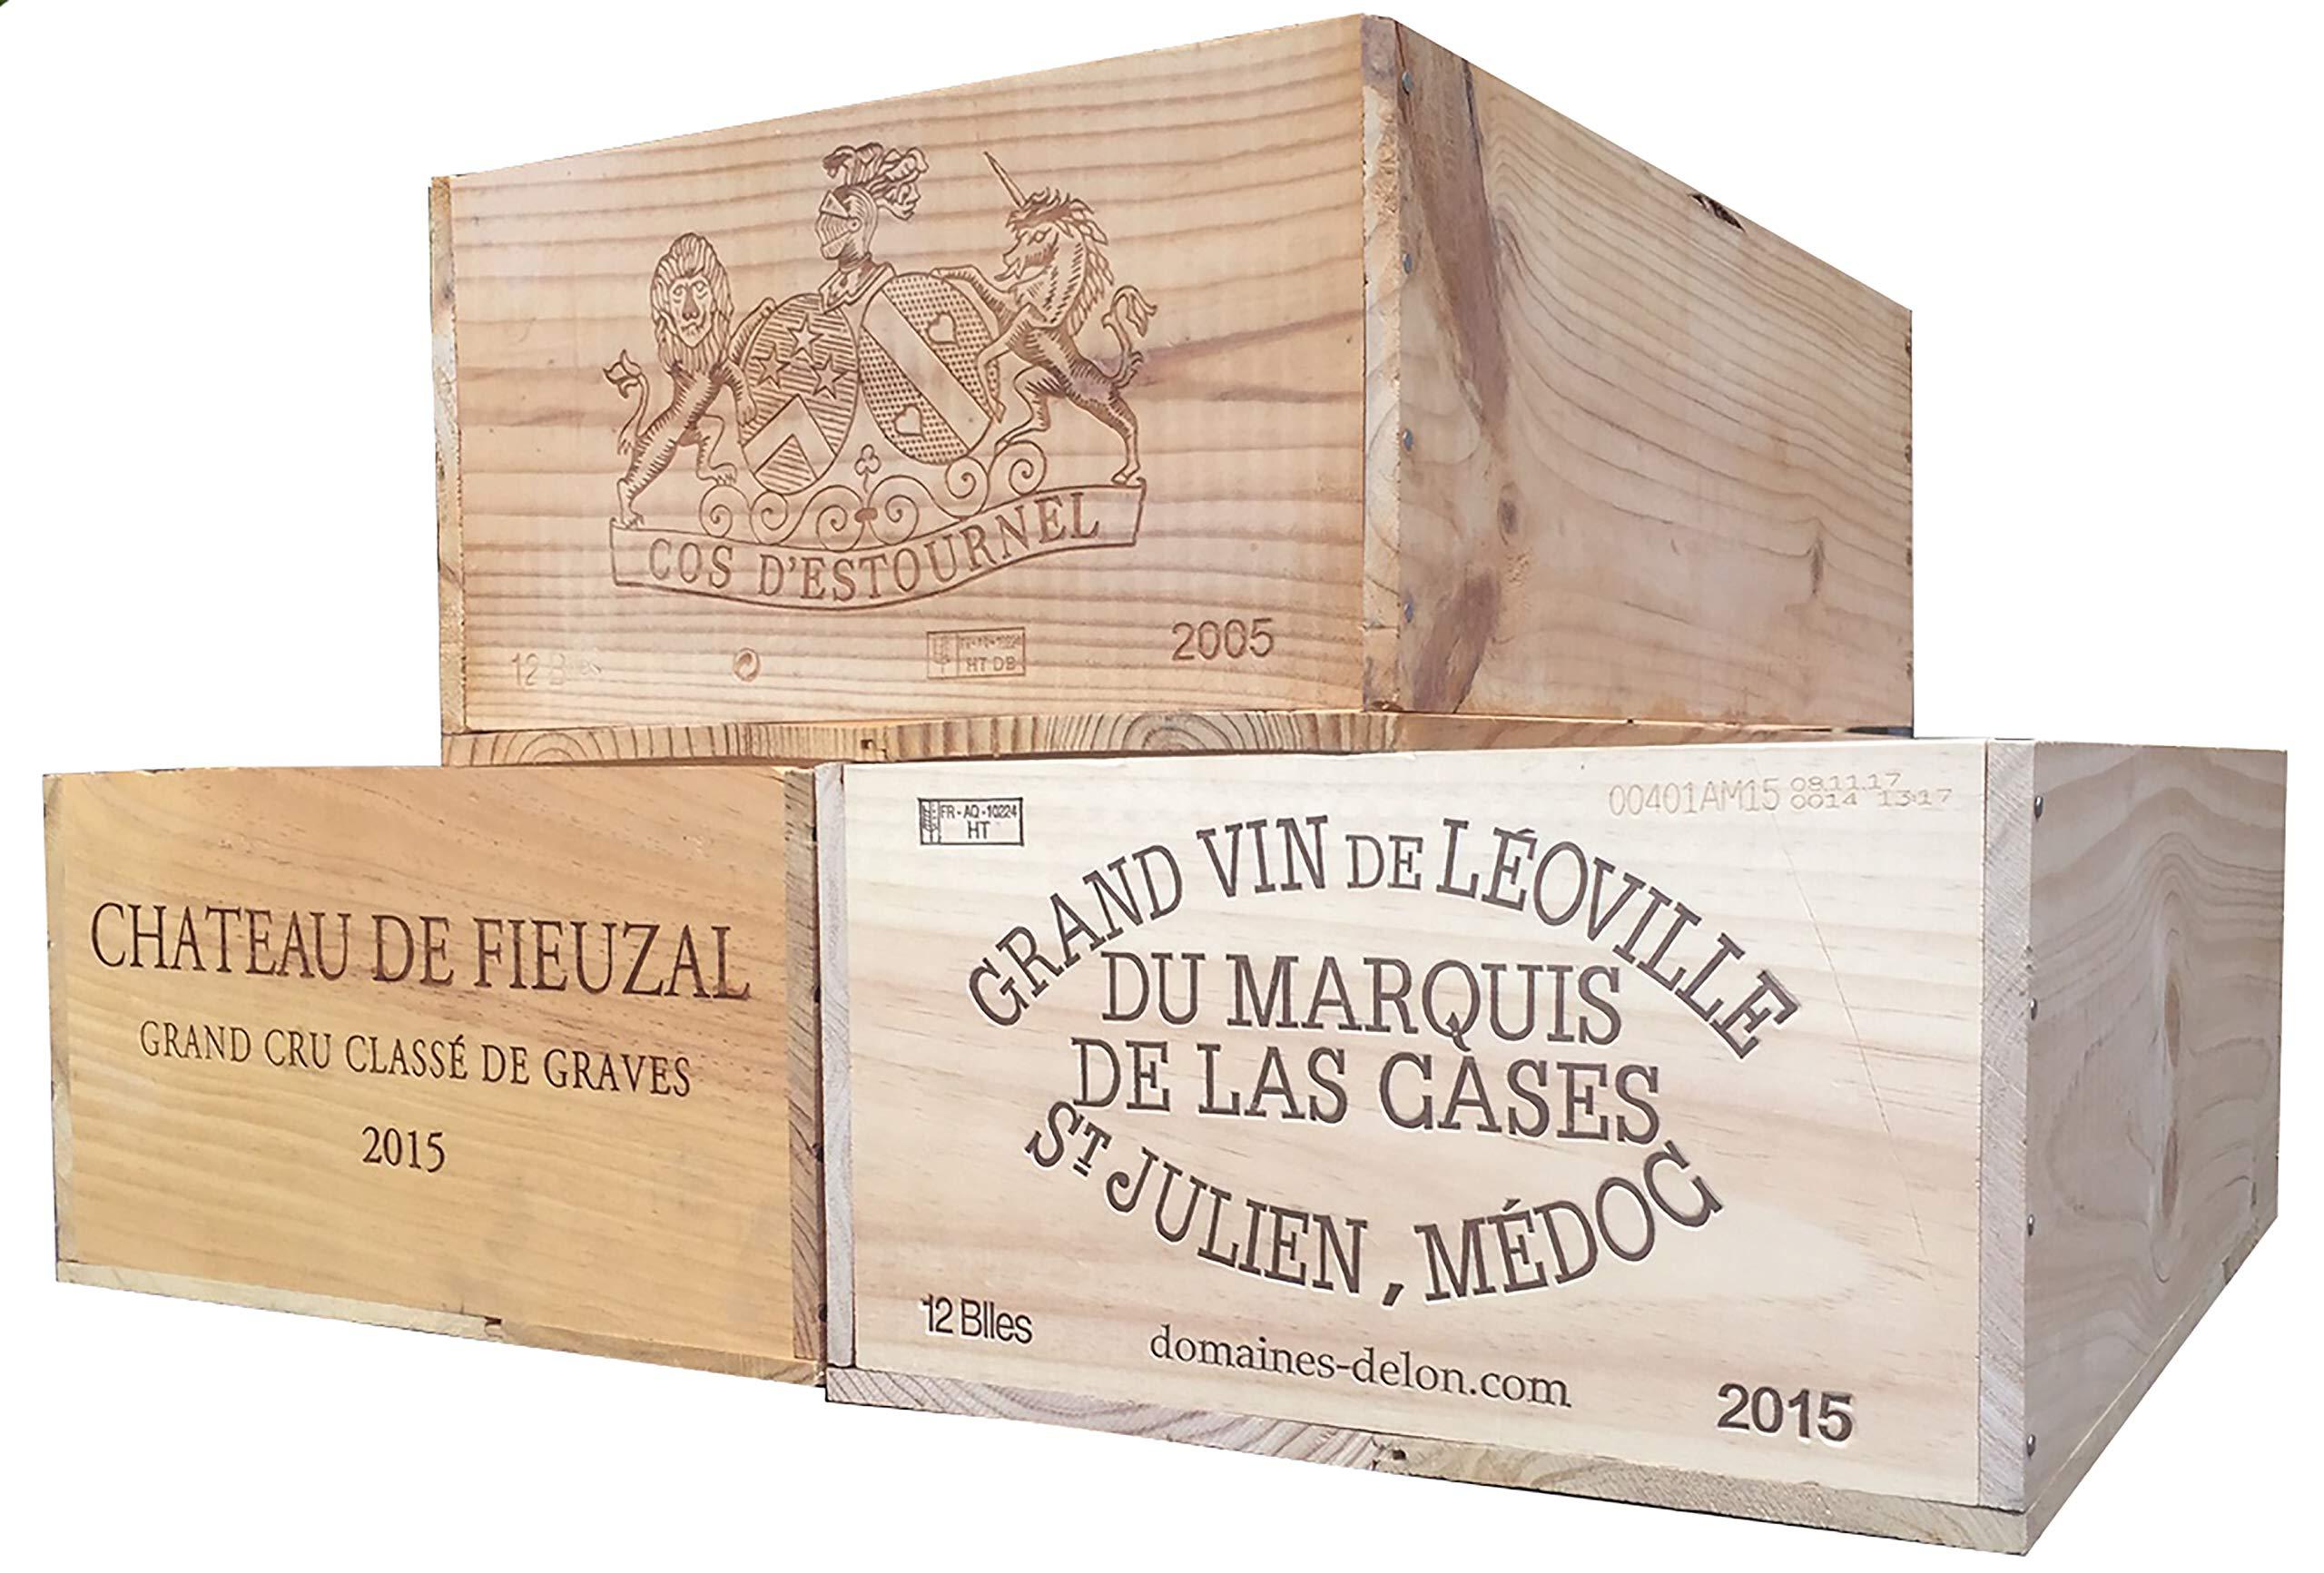 Vineyard Crates One (1) Decorative French Wine Crate - Wooden Box for Wine Storage Wedding Decor DIY Projects Garden Planter Boxes NO Lid NO Storage Inserts (12BtlStd) by Vineyard Crates